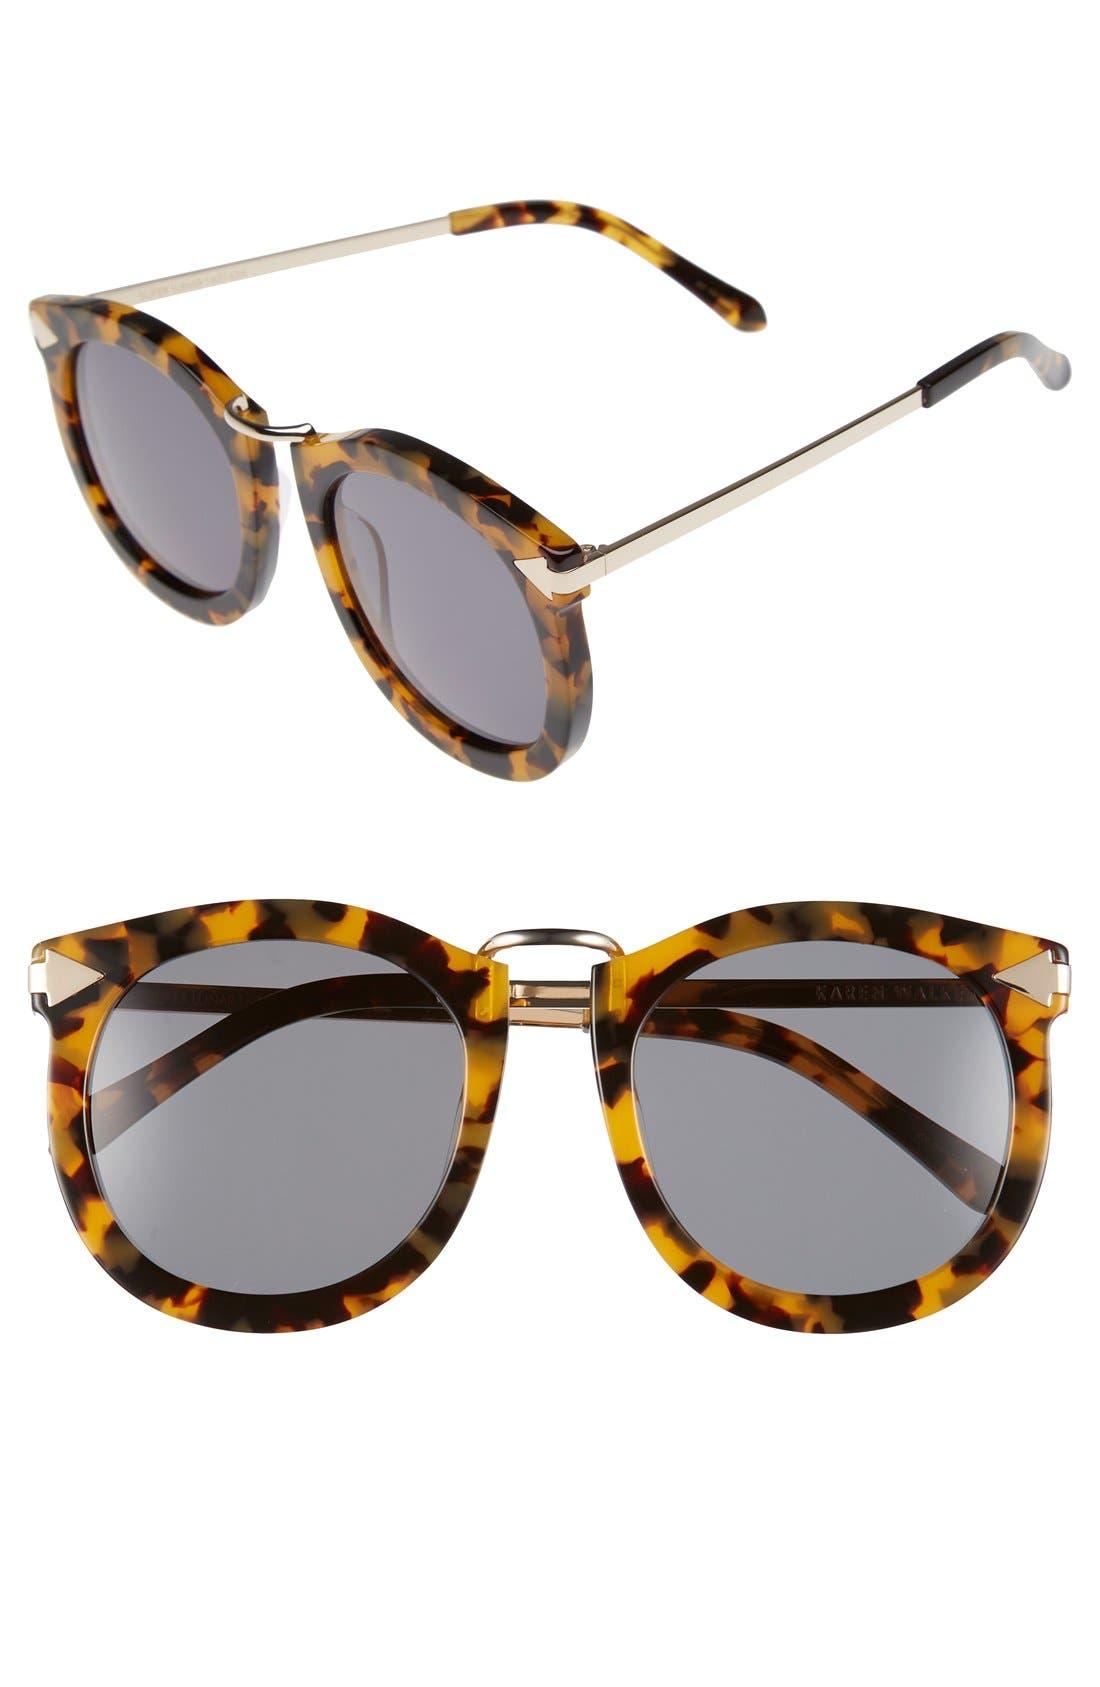 Karen Walker 'Super Lunar - Arrowed by Karen' 52mm Sunglasses